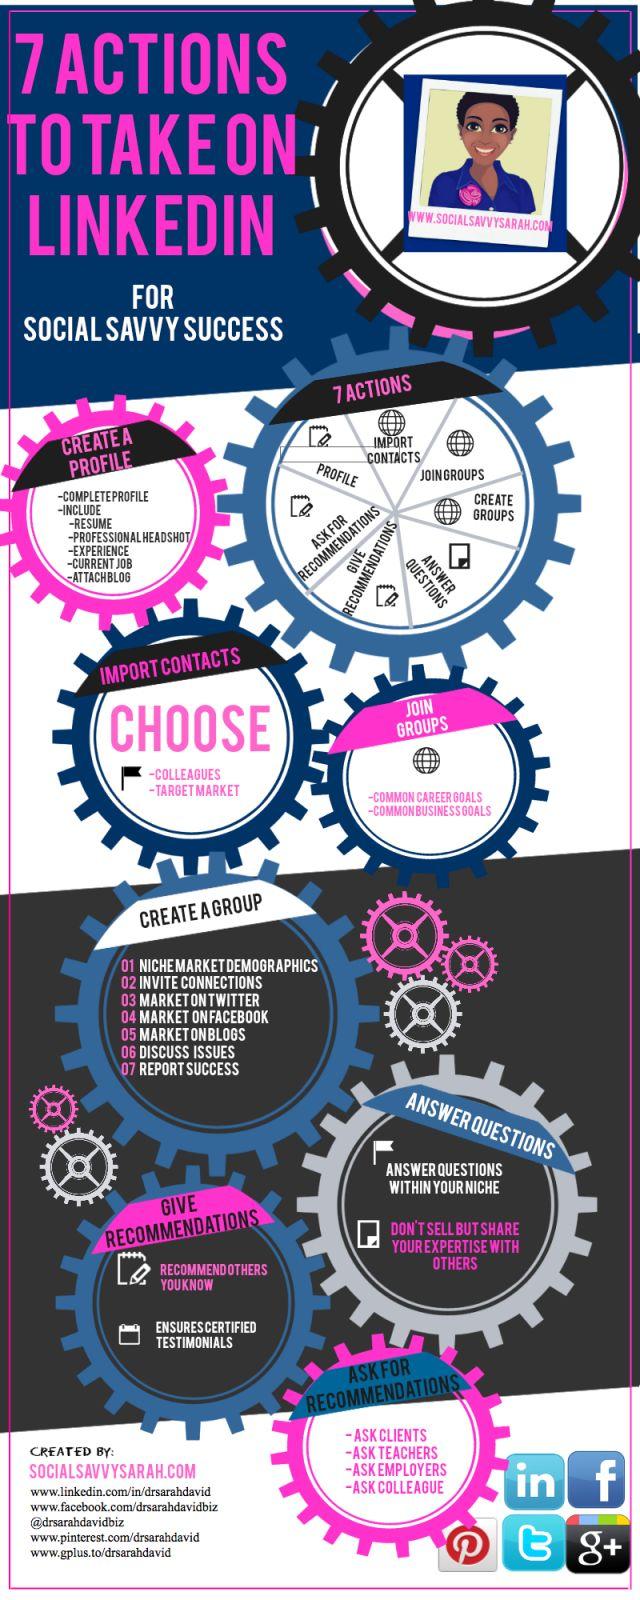 7 actions to take on Linkedin for social savy success #infografia #infographic #socialmedia